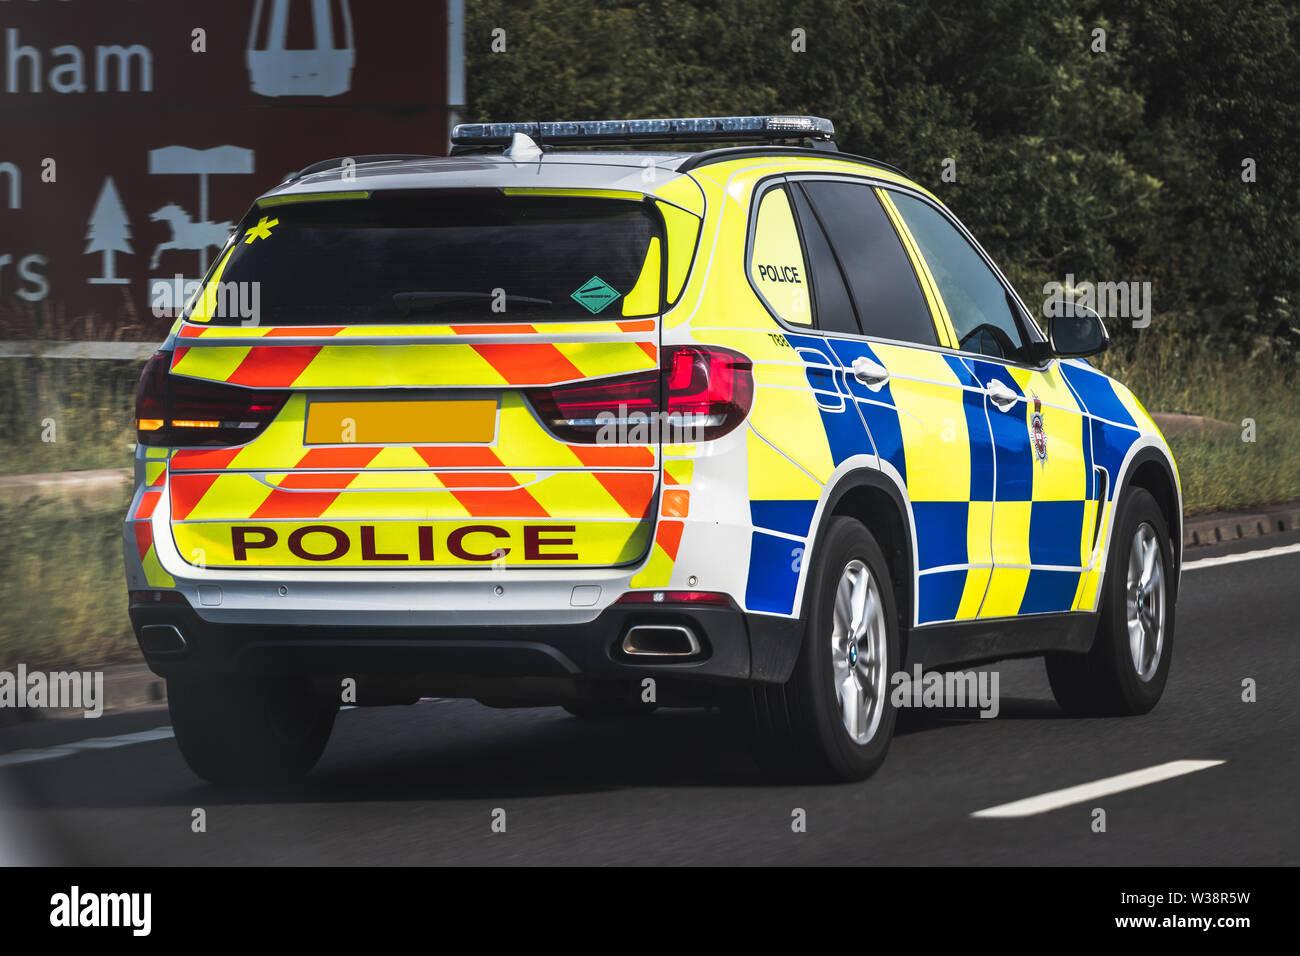 Marked Police 4x4 Responding to emergency speeding down motorway. Stock Photo